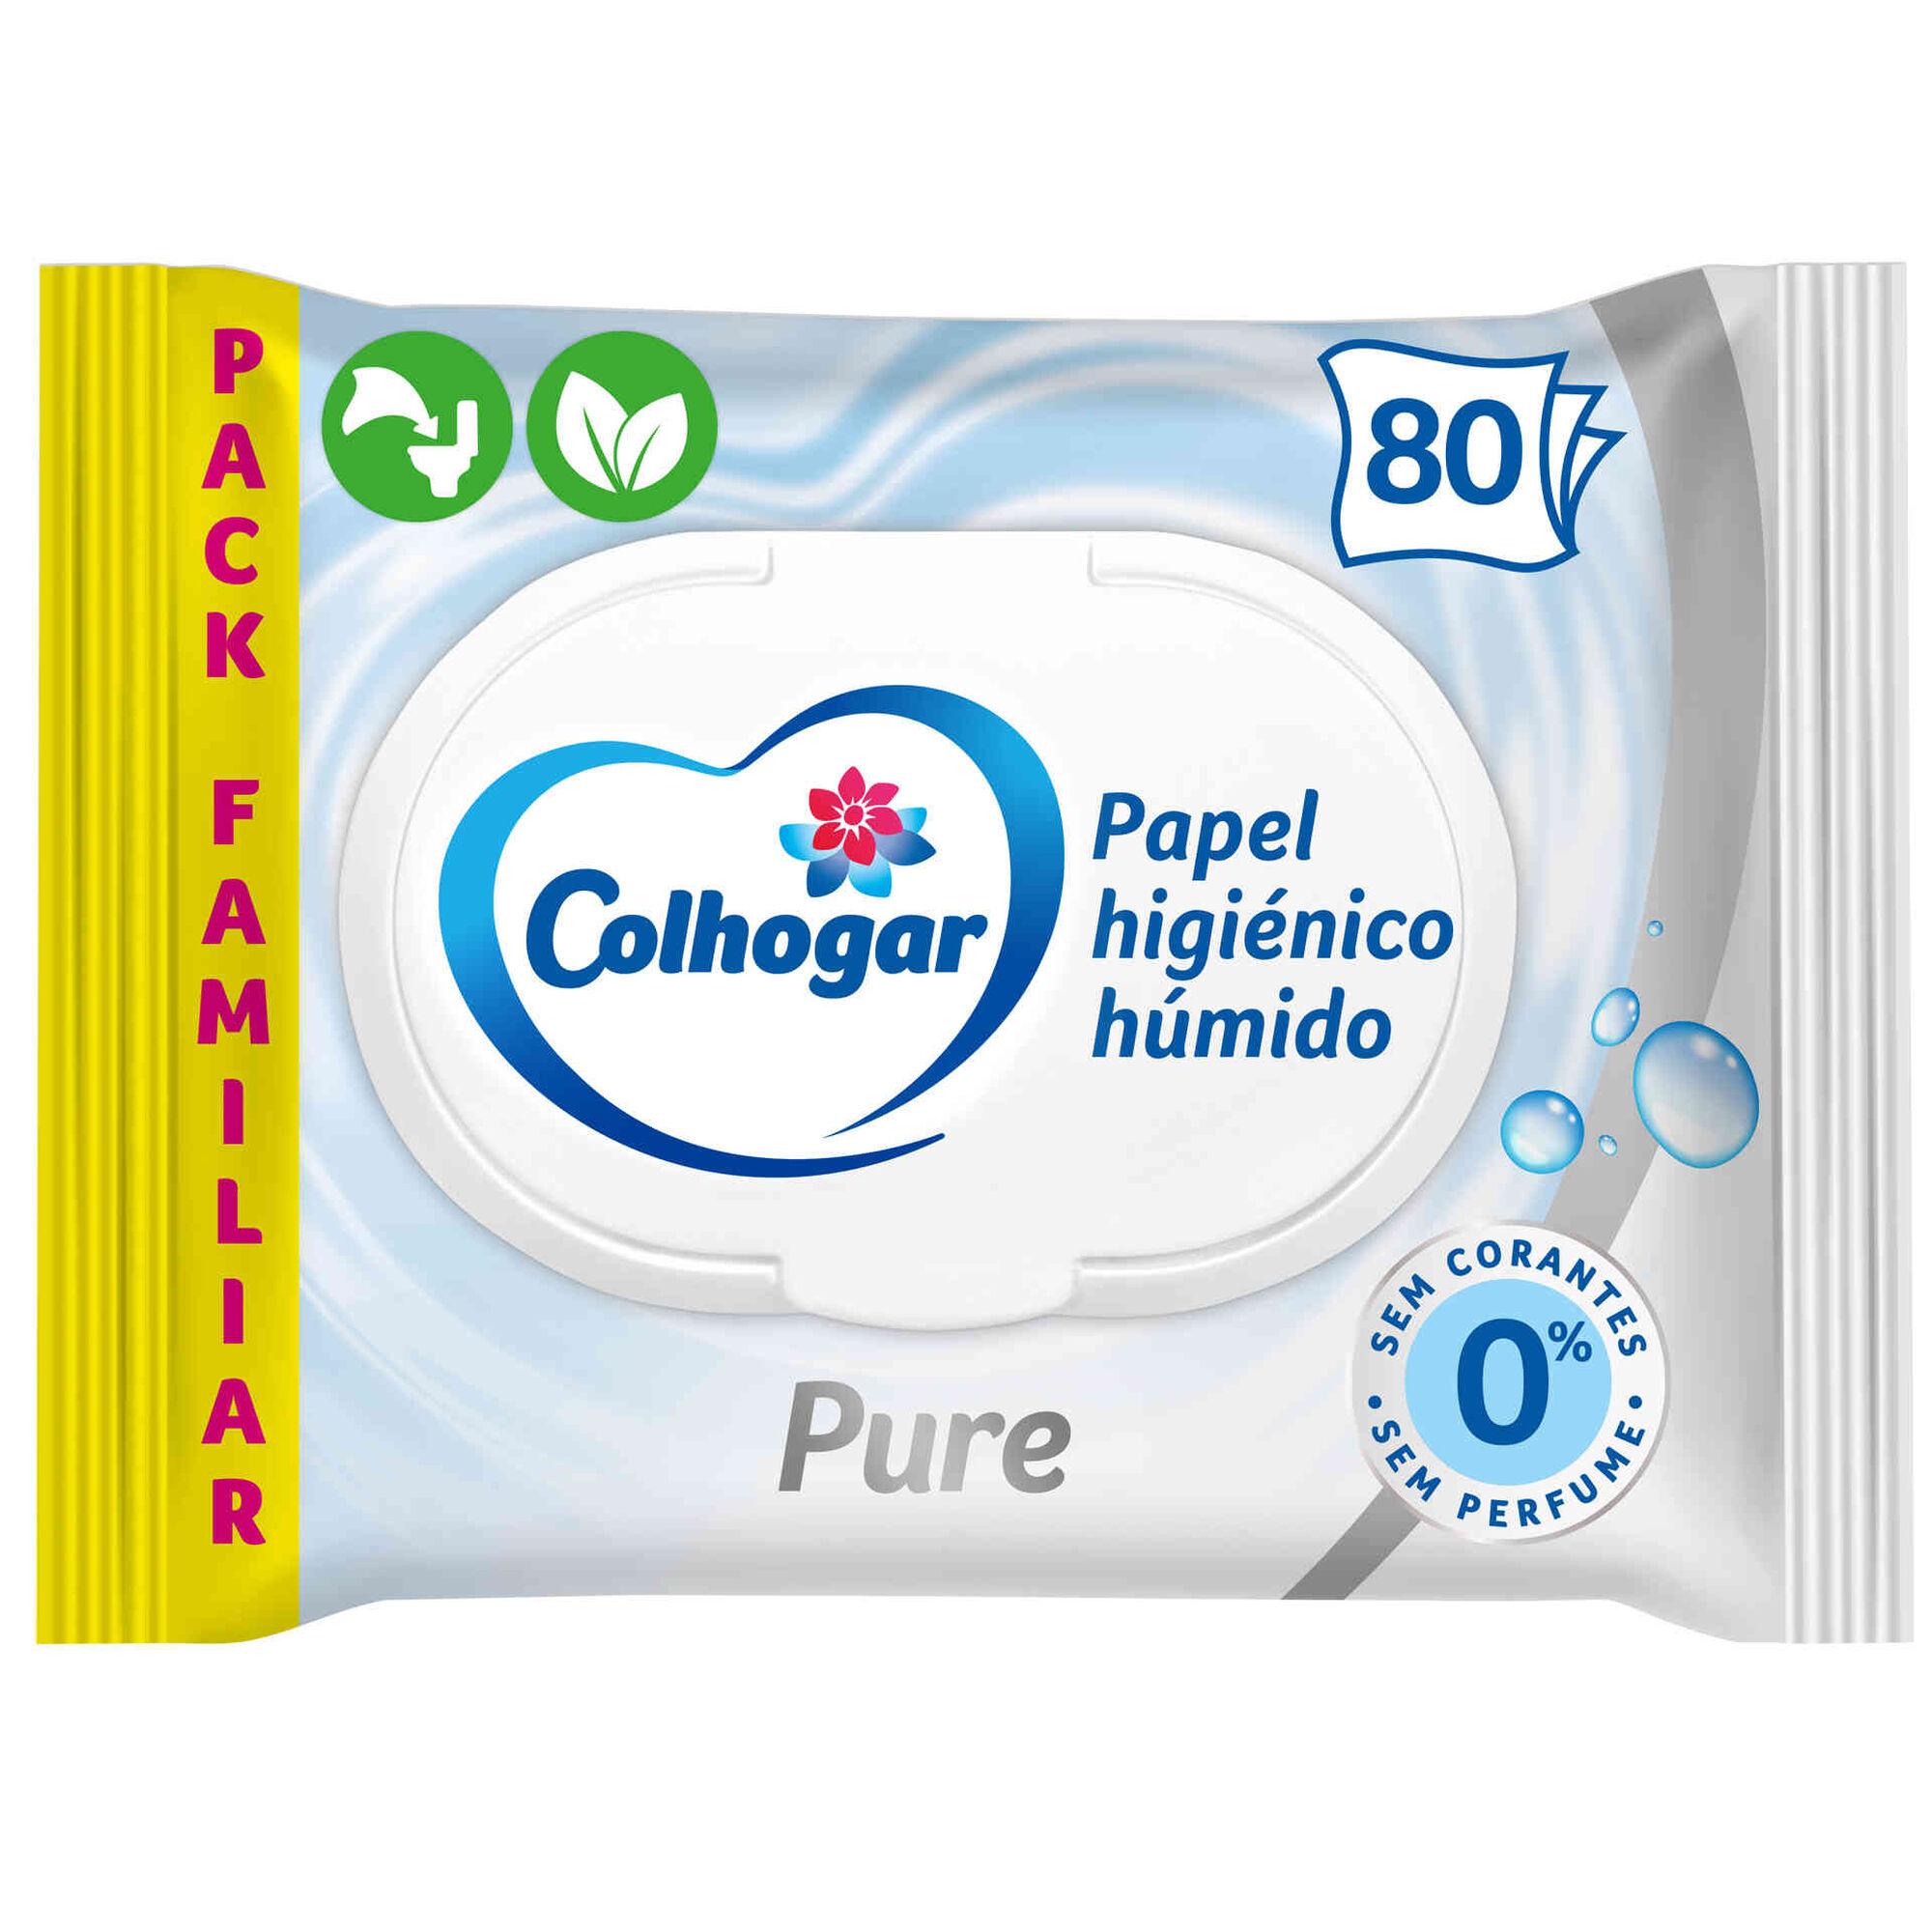 Papel Higiénico Húmido Pure